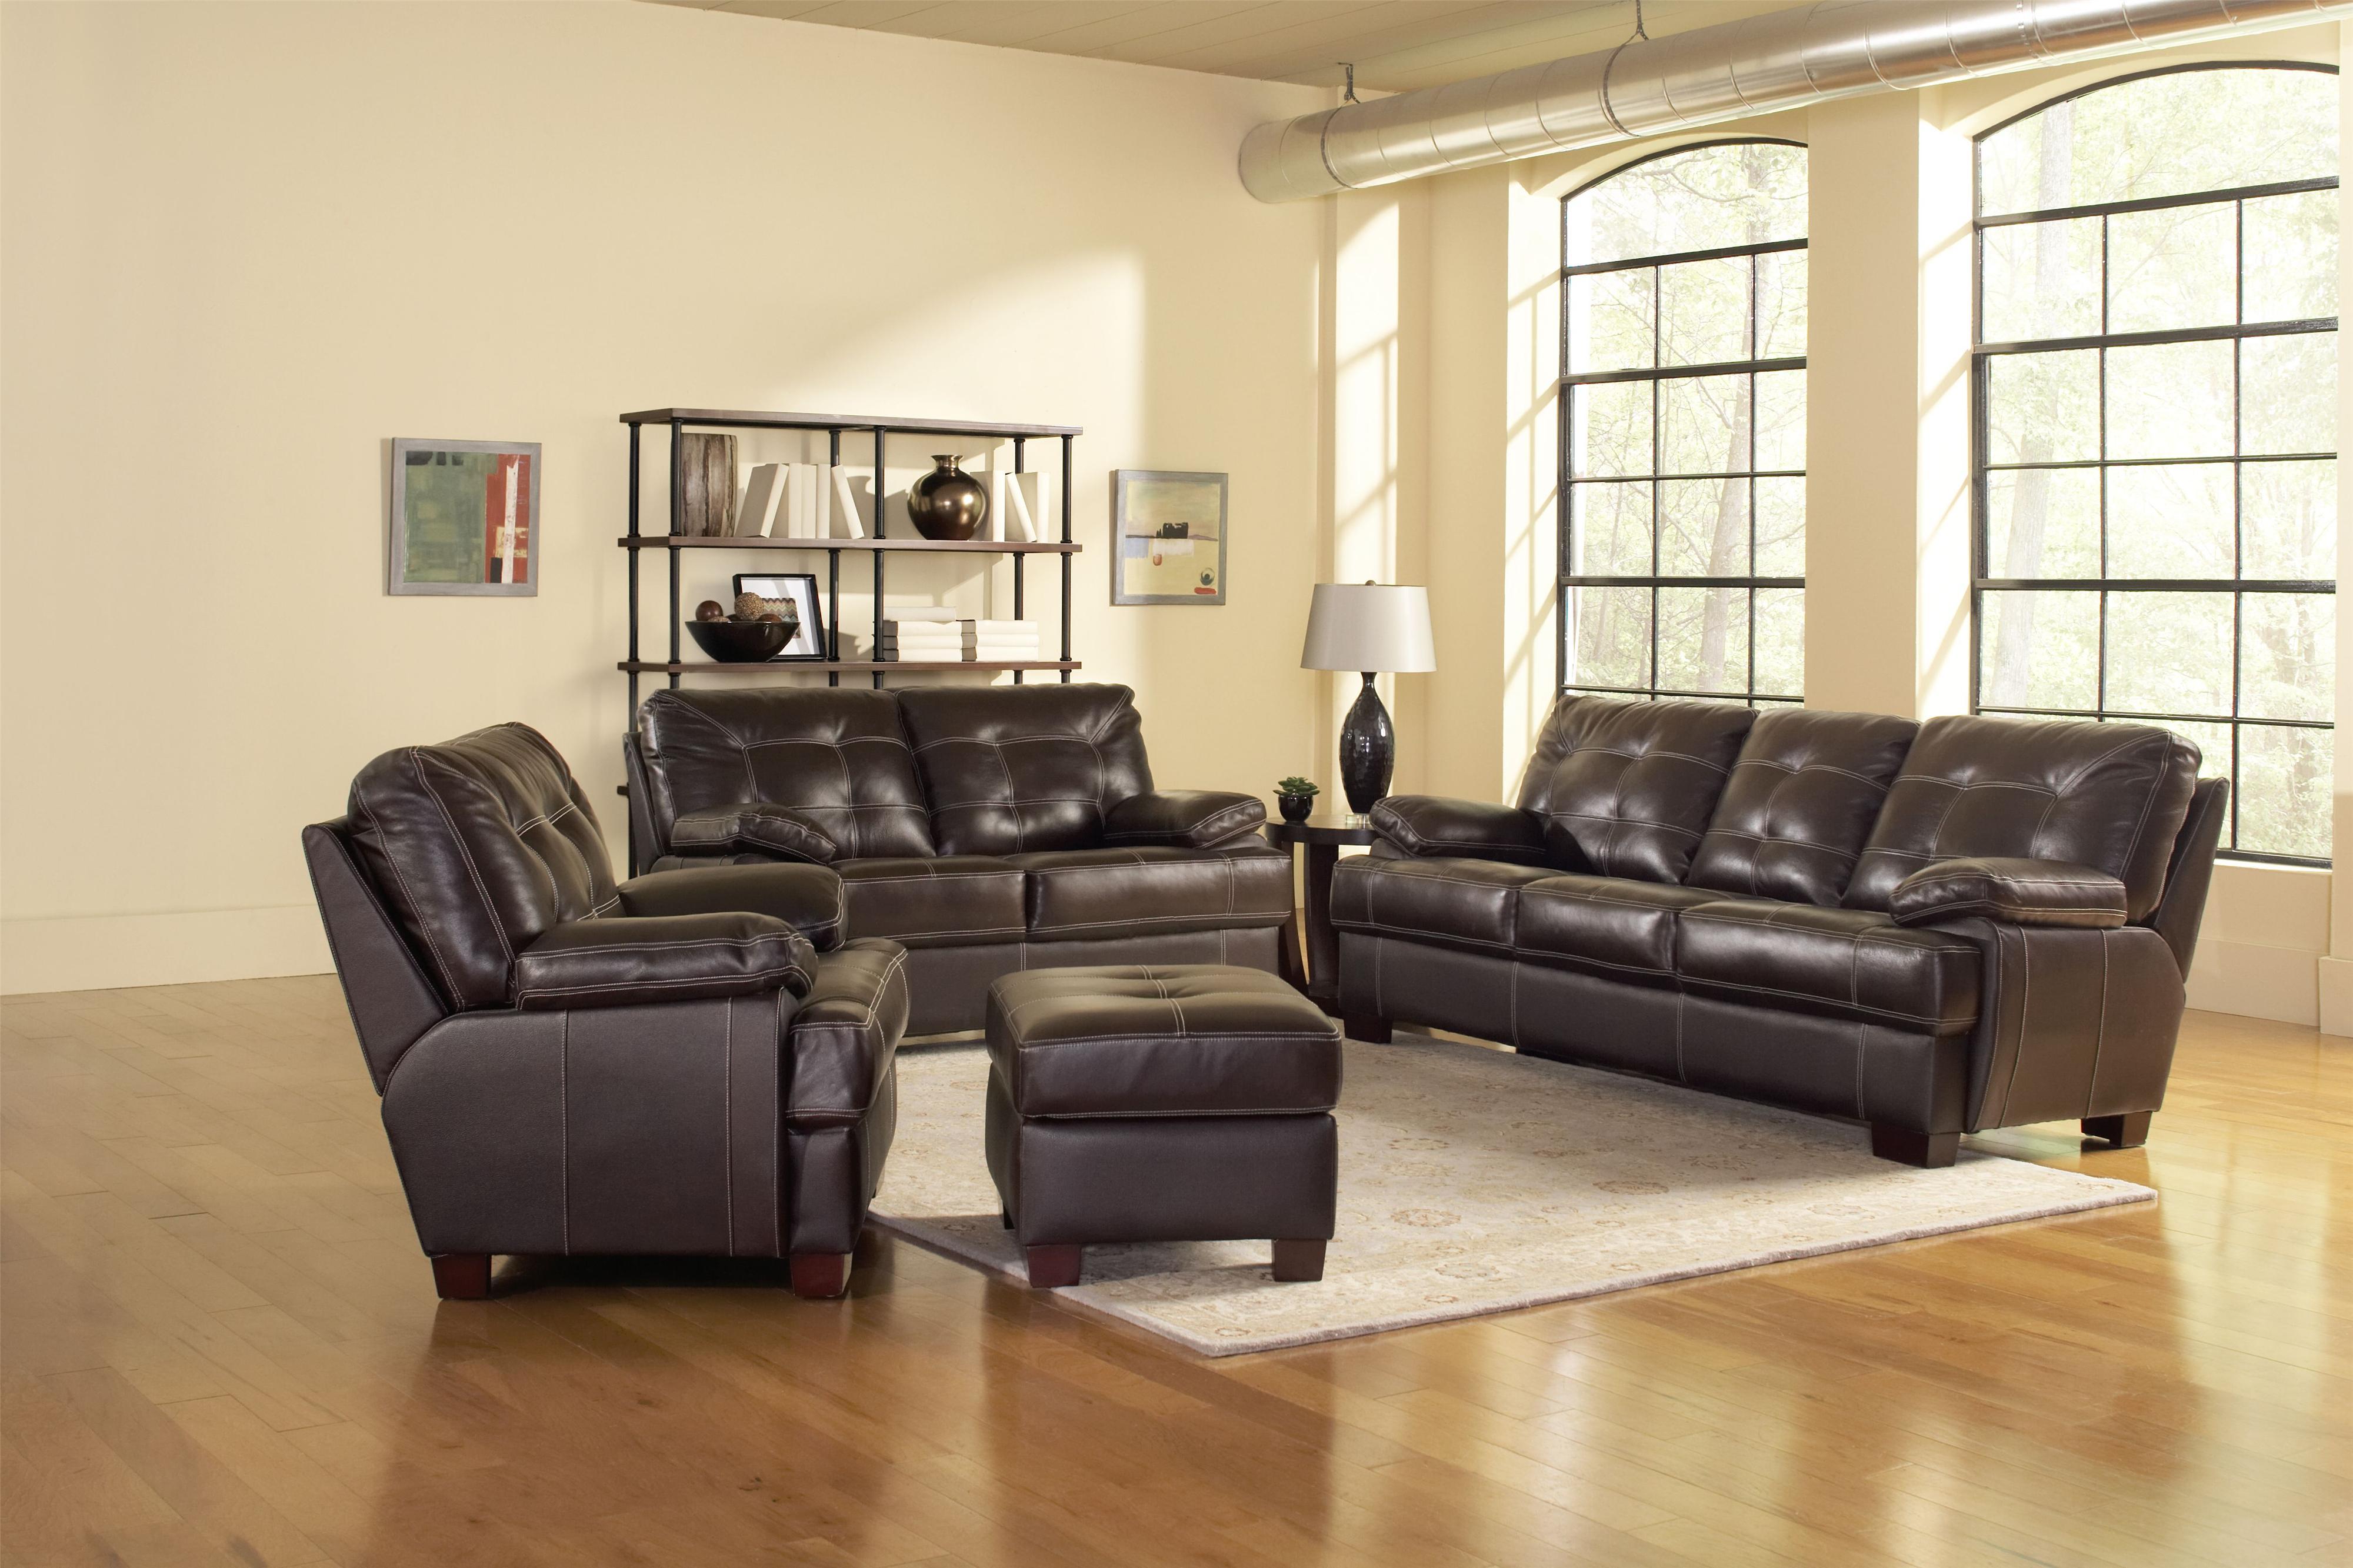 Leather Italia USA Dalton Stationary Living Room Group